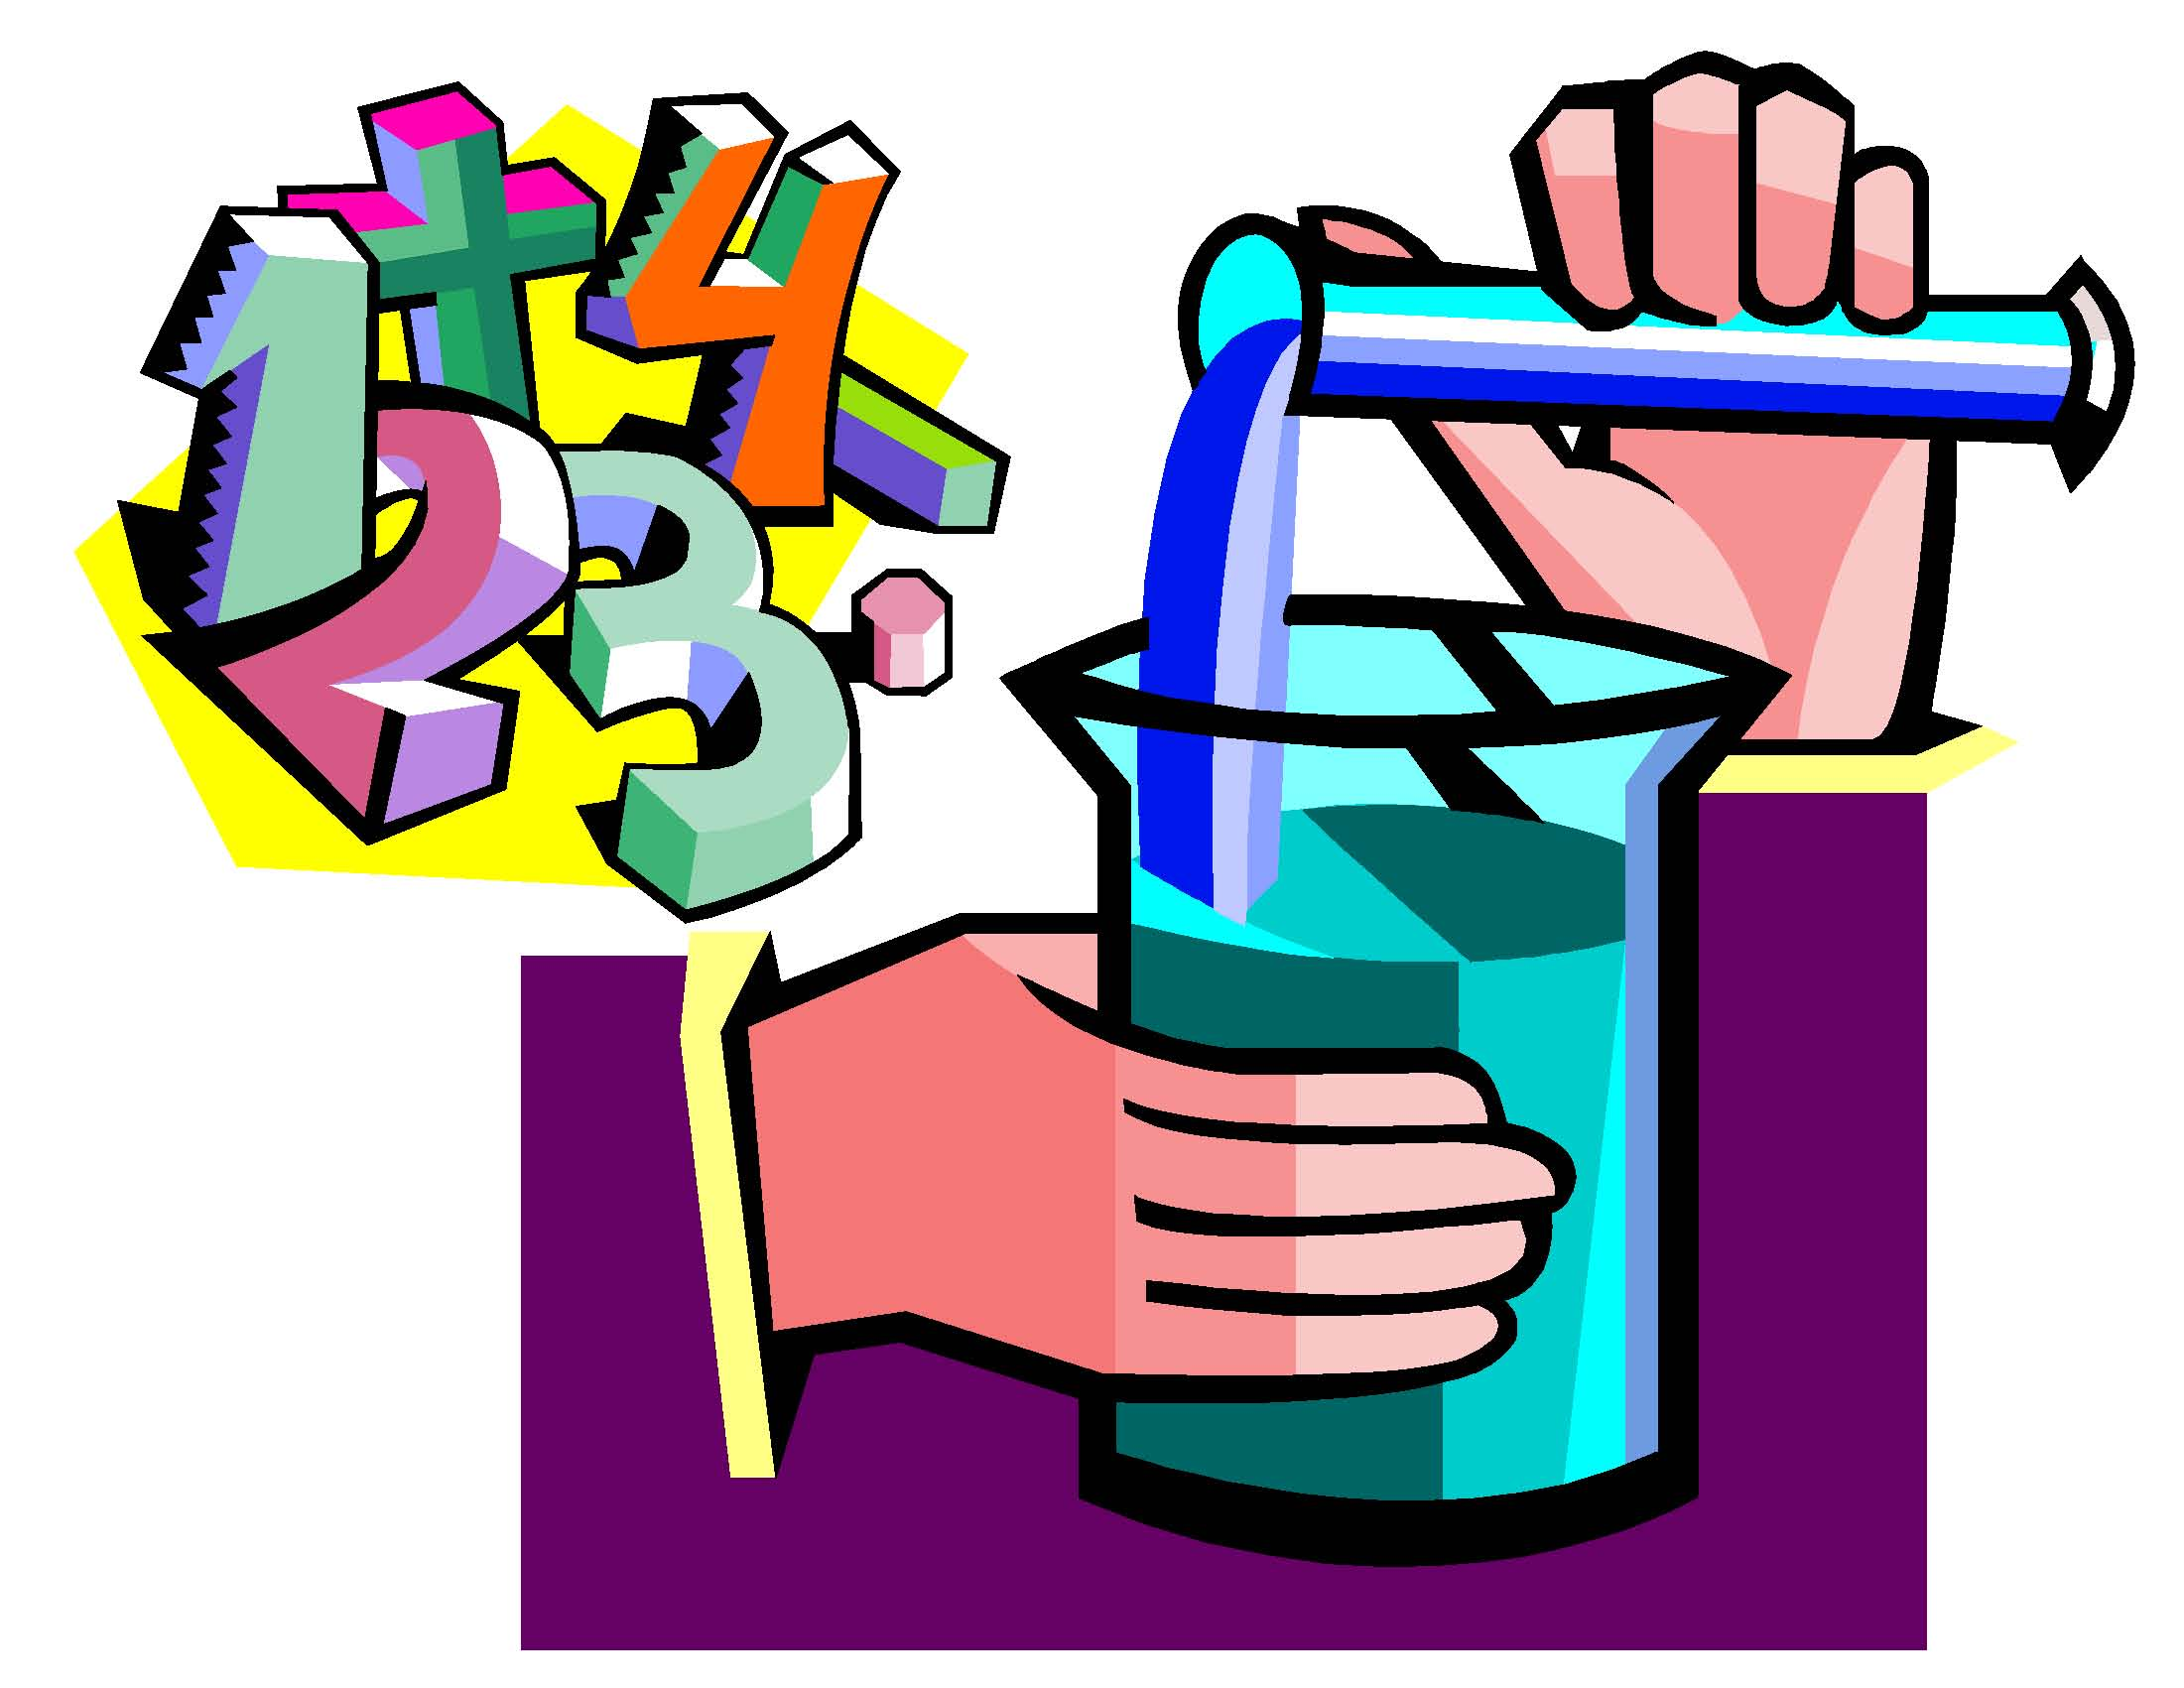 2201x1701 Science Clipart Graphic Clip Art